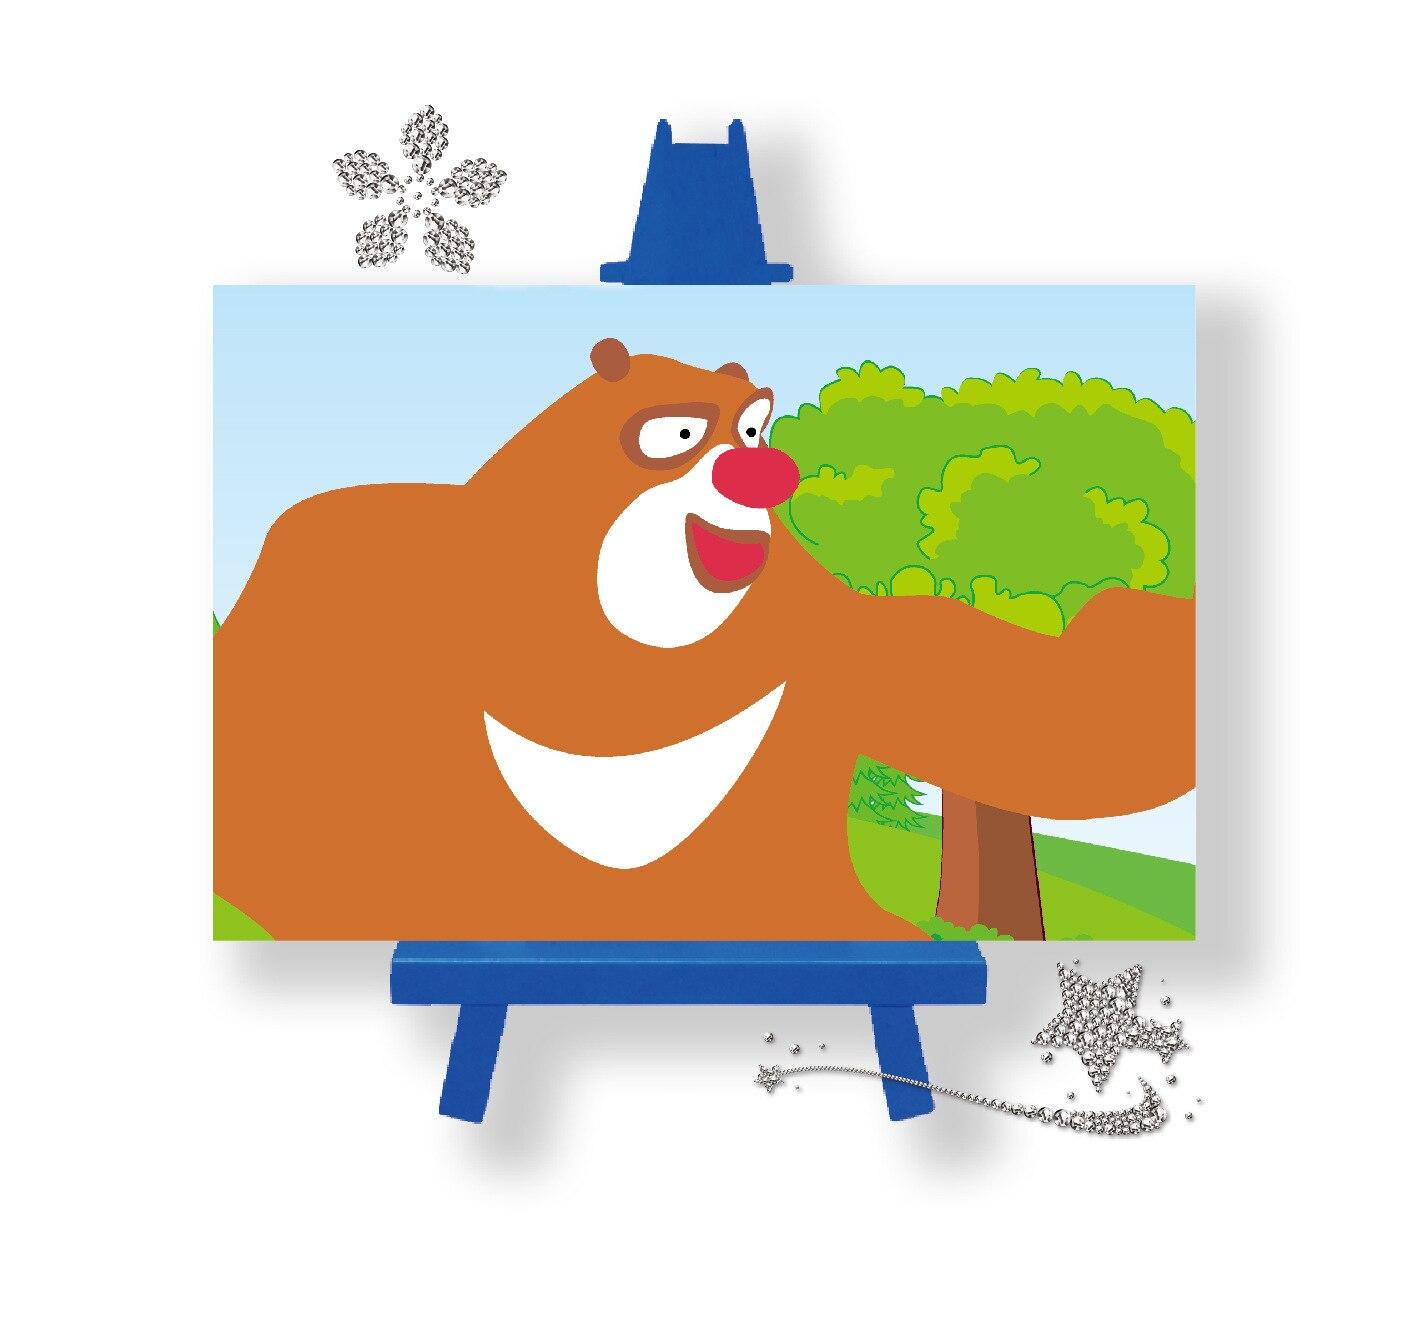 Unduh 7800 Gambar Animasi Kartun Tentang Pendidikan Gratis